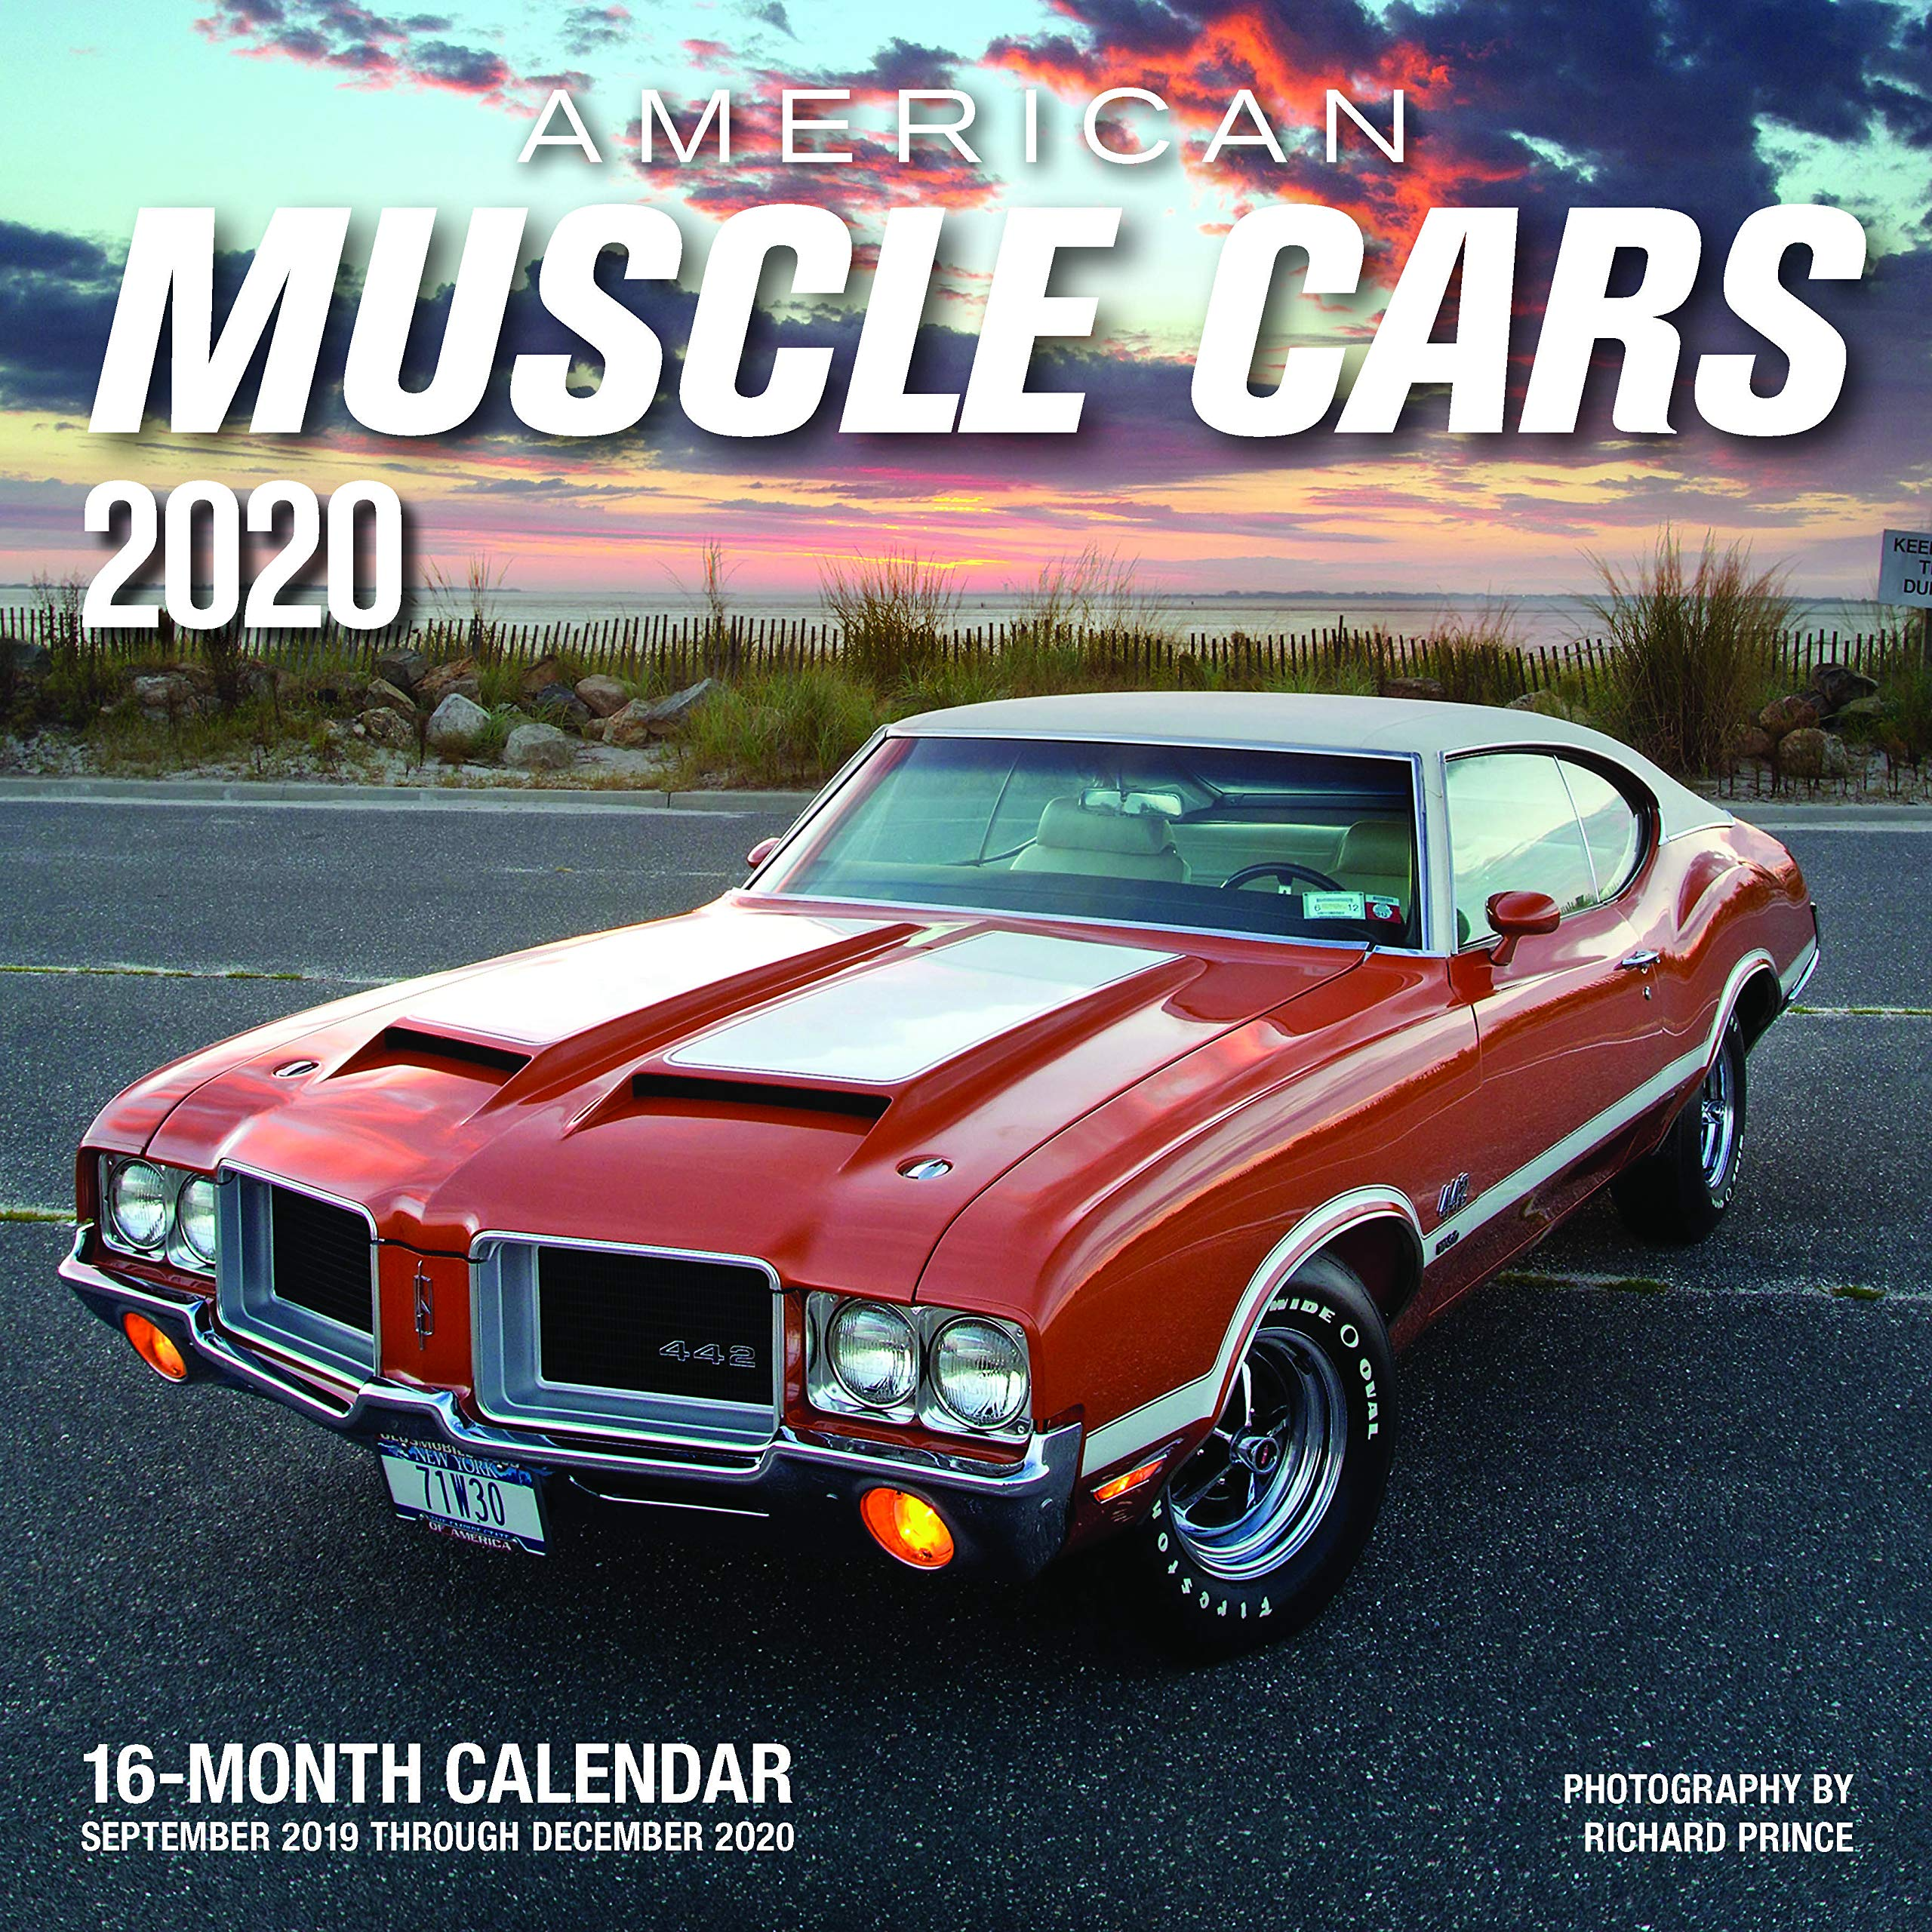 New York Movie Premiere December 2020 Calendar American Muscle Cars 2020: 16 Month Calendar Includes September